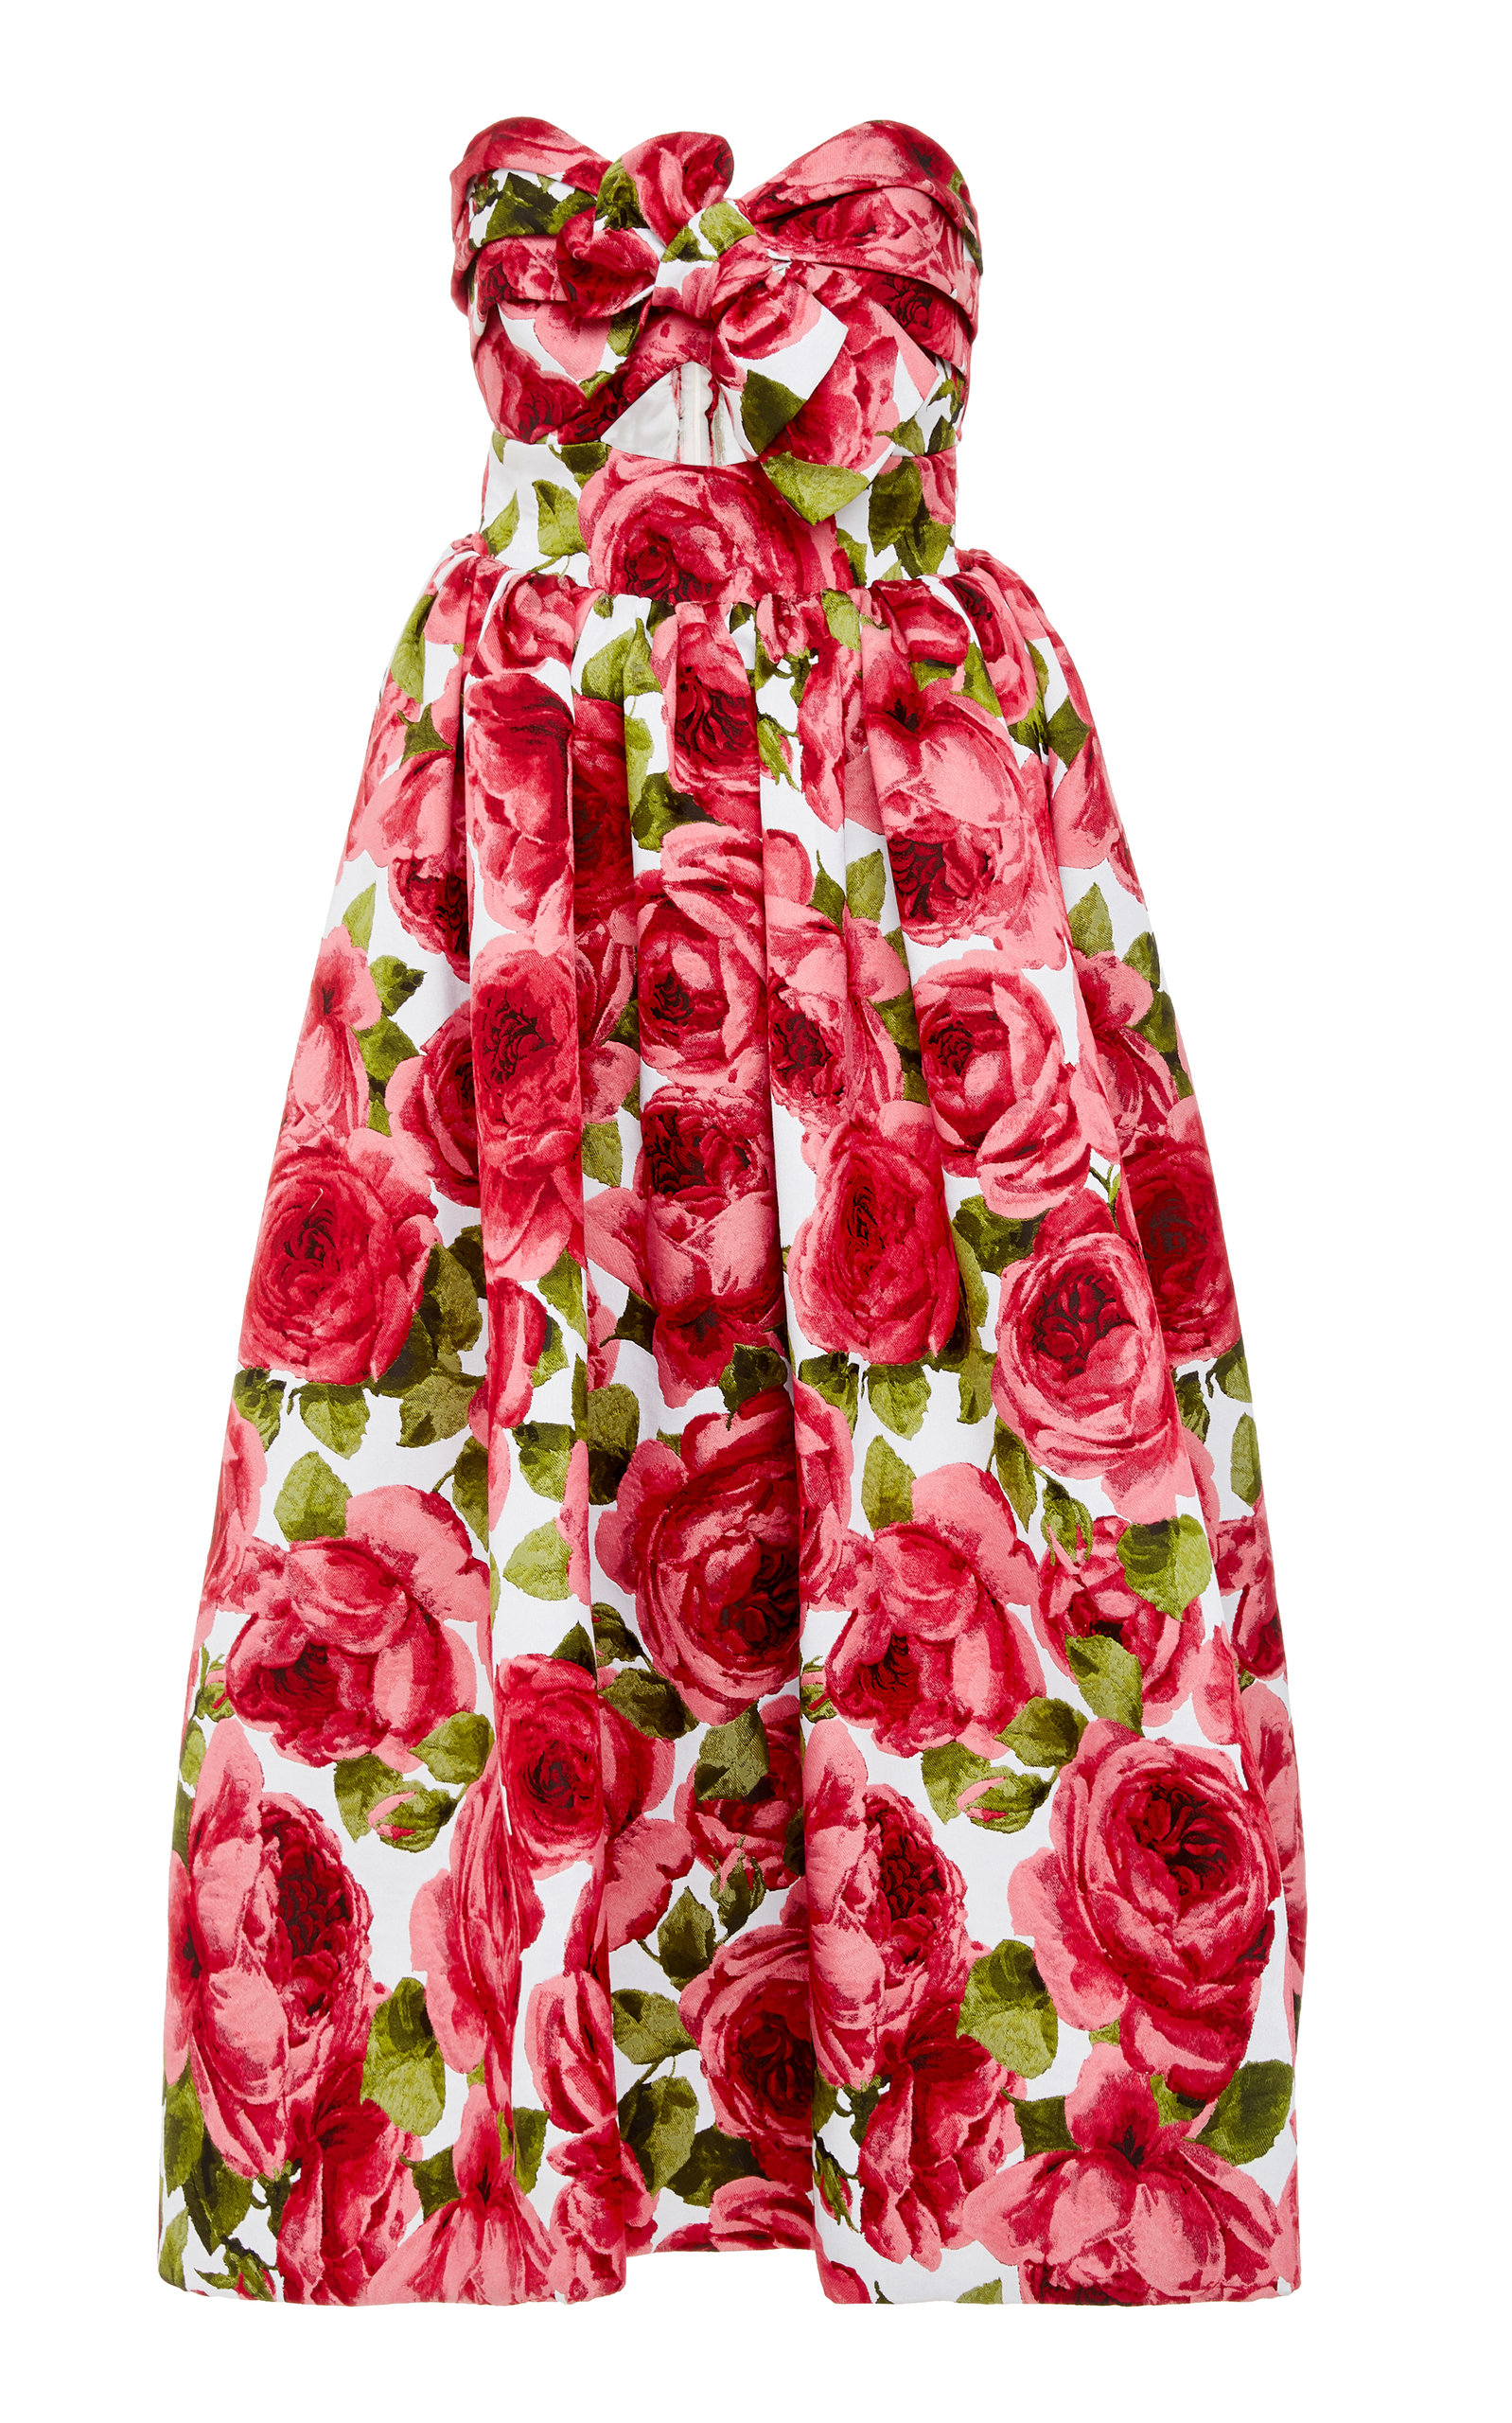 Strapless Floral Print Jacquard Midi Dress by Michael Kors